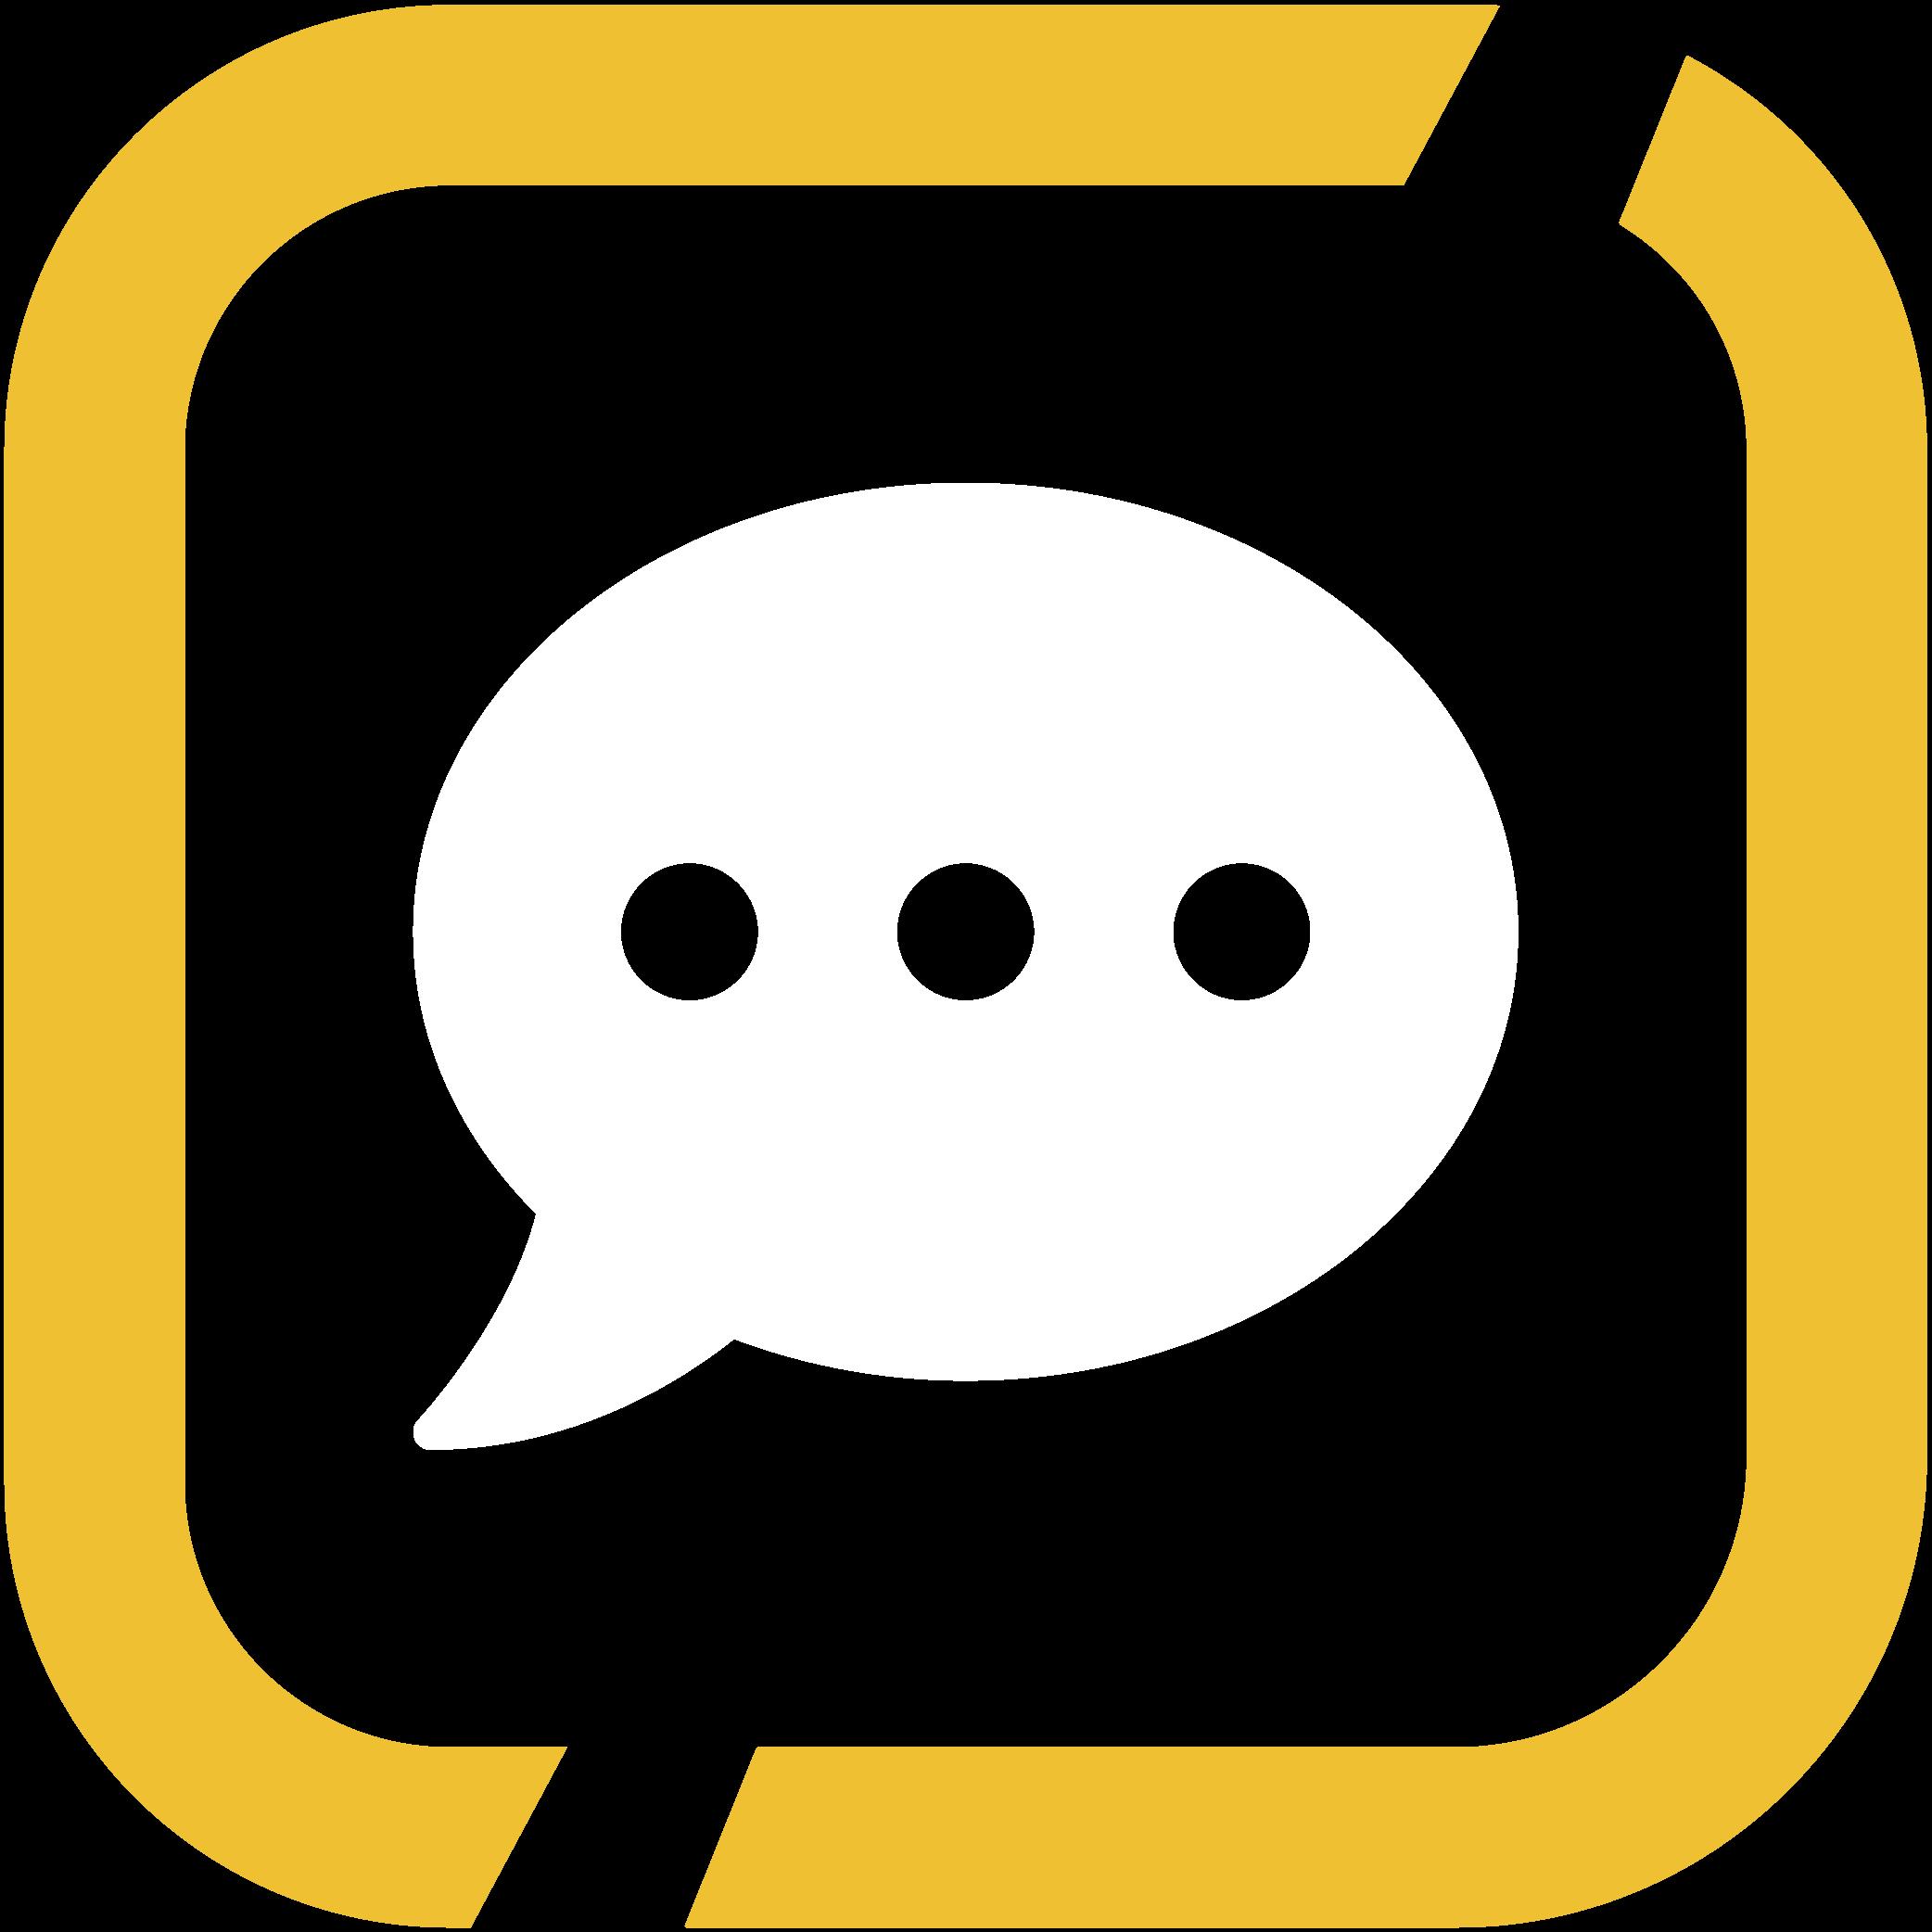 B2B marketers - words matter at Etymon